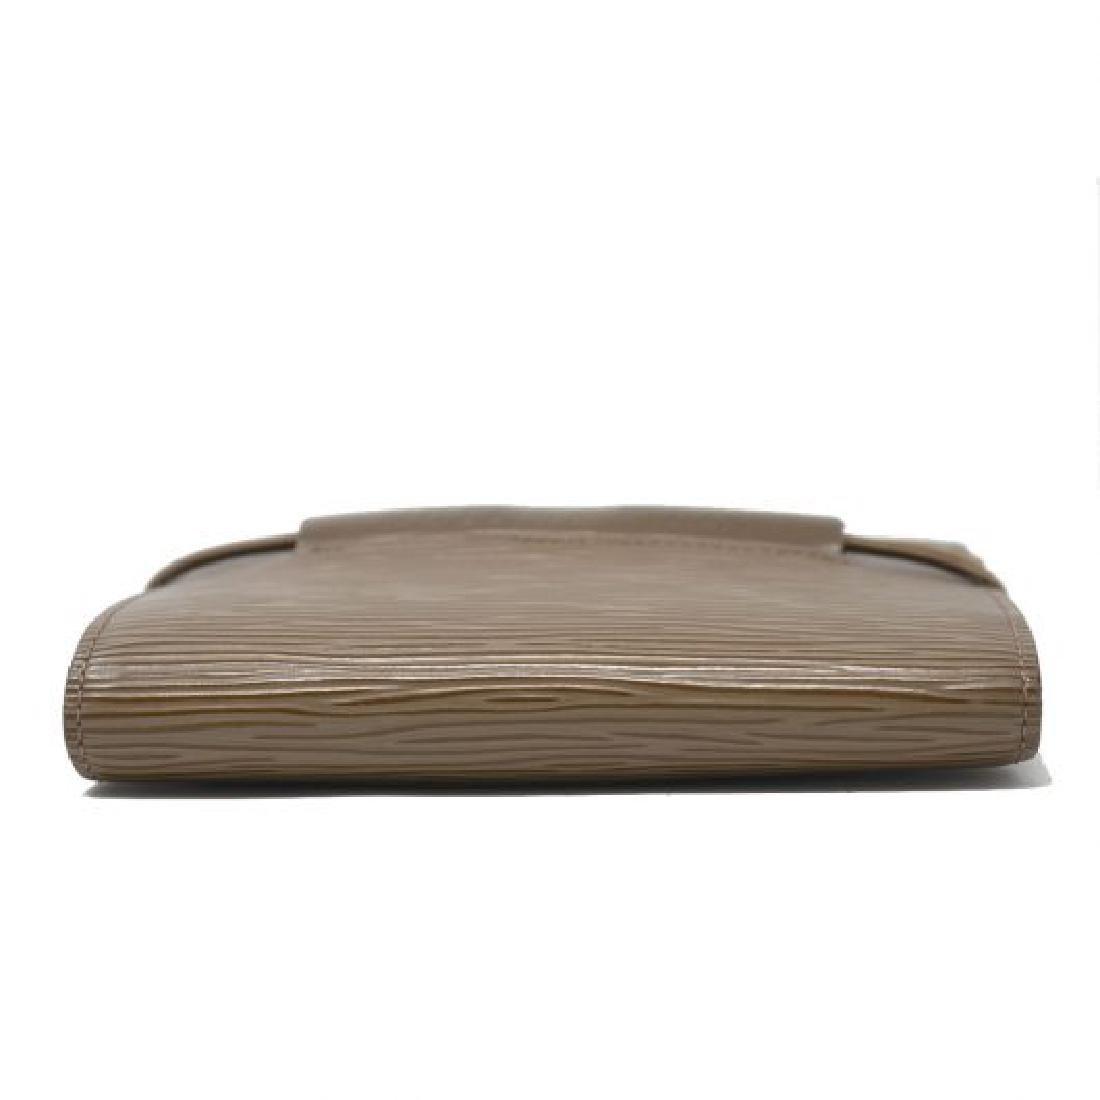 Louis Vuitton  Epi Leather Wallet - 5